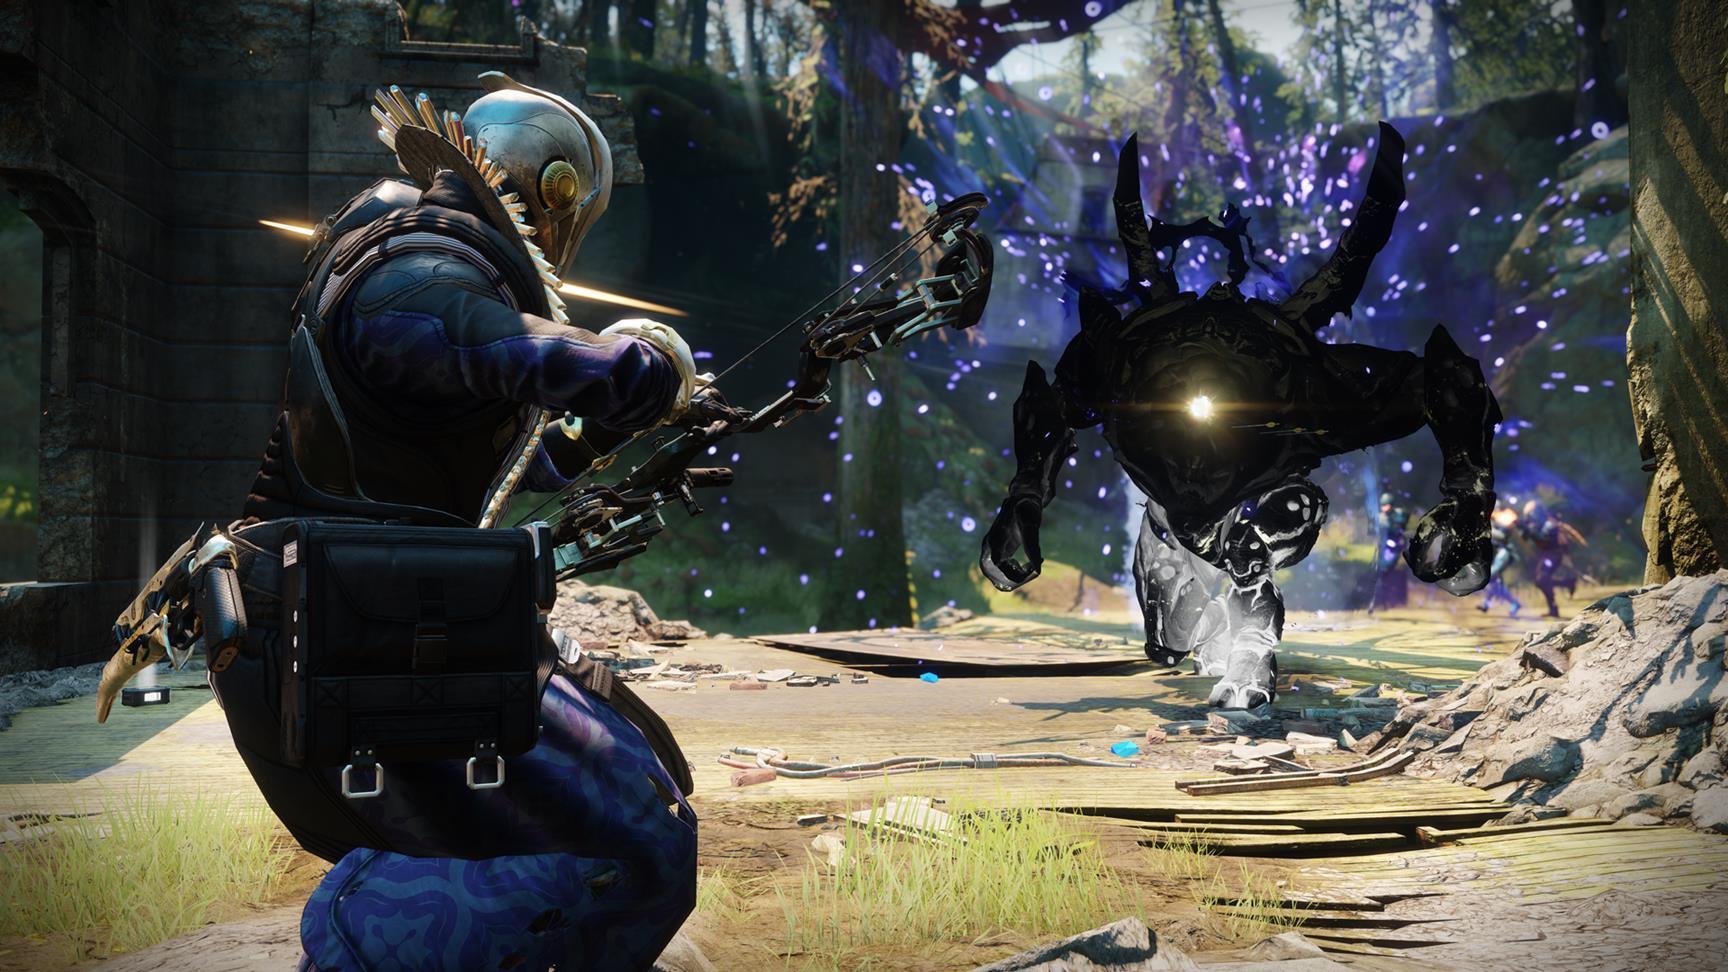 Destiny 2: Forsaken - Malfeasance quest is being simplified, October